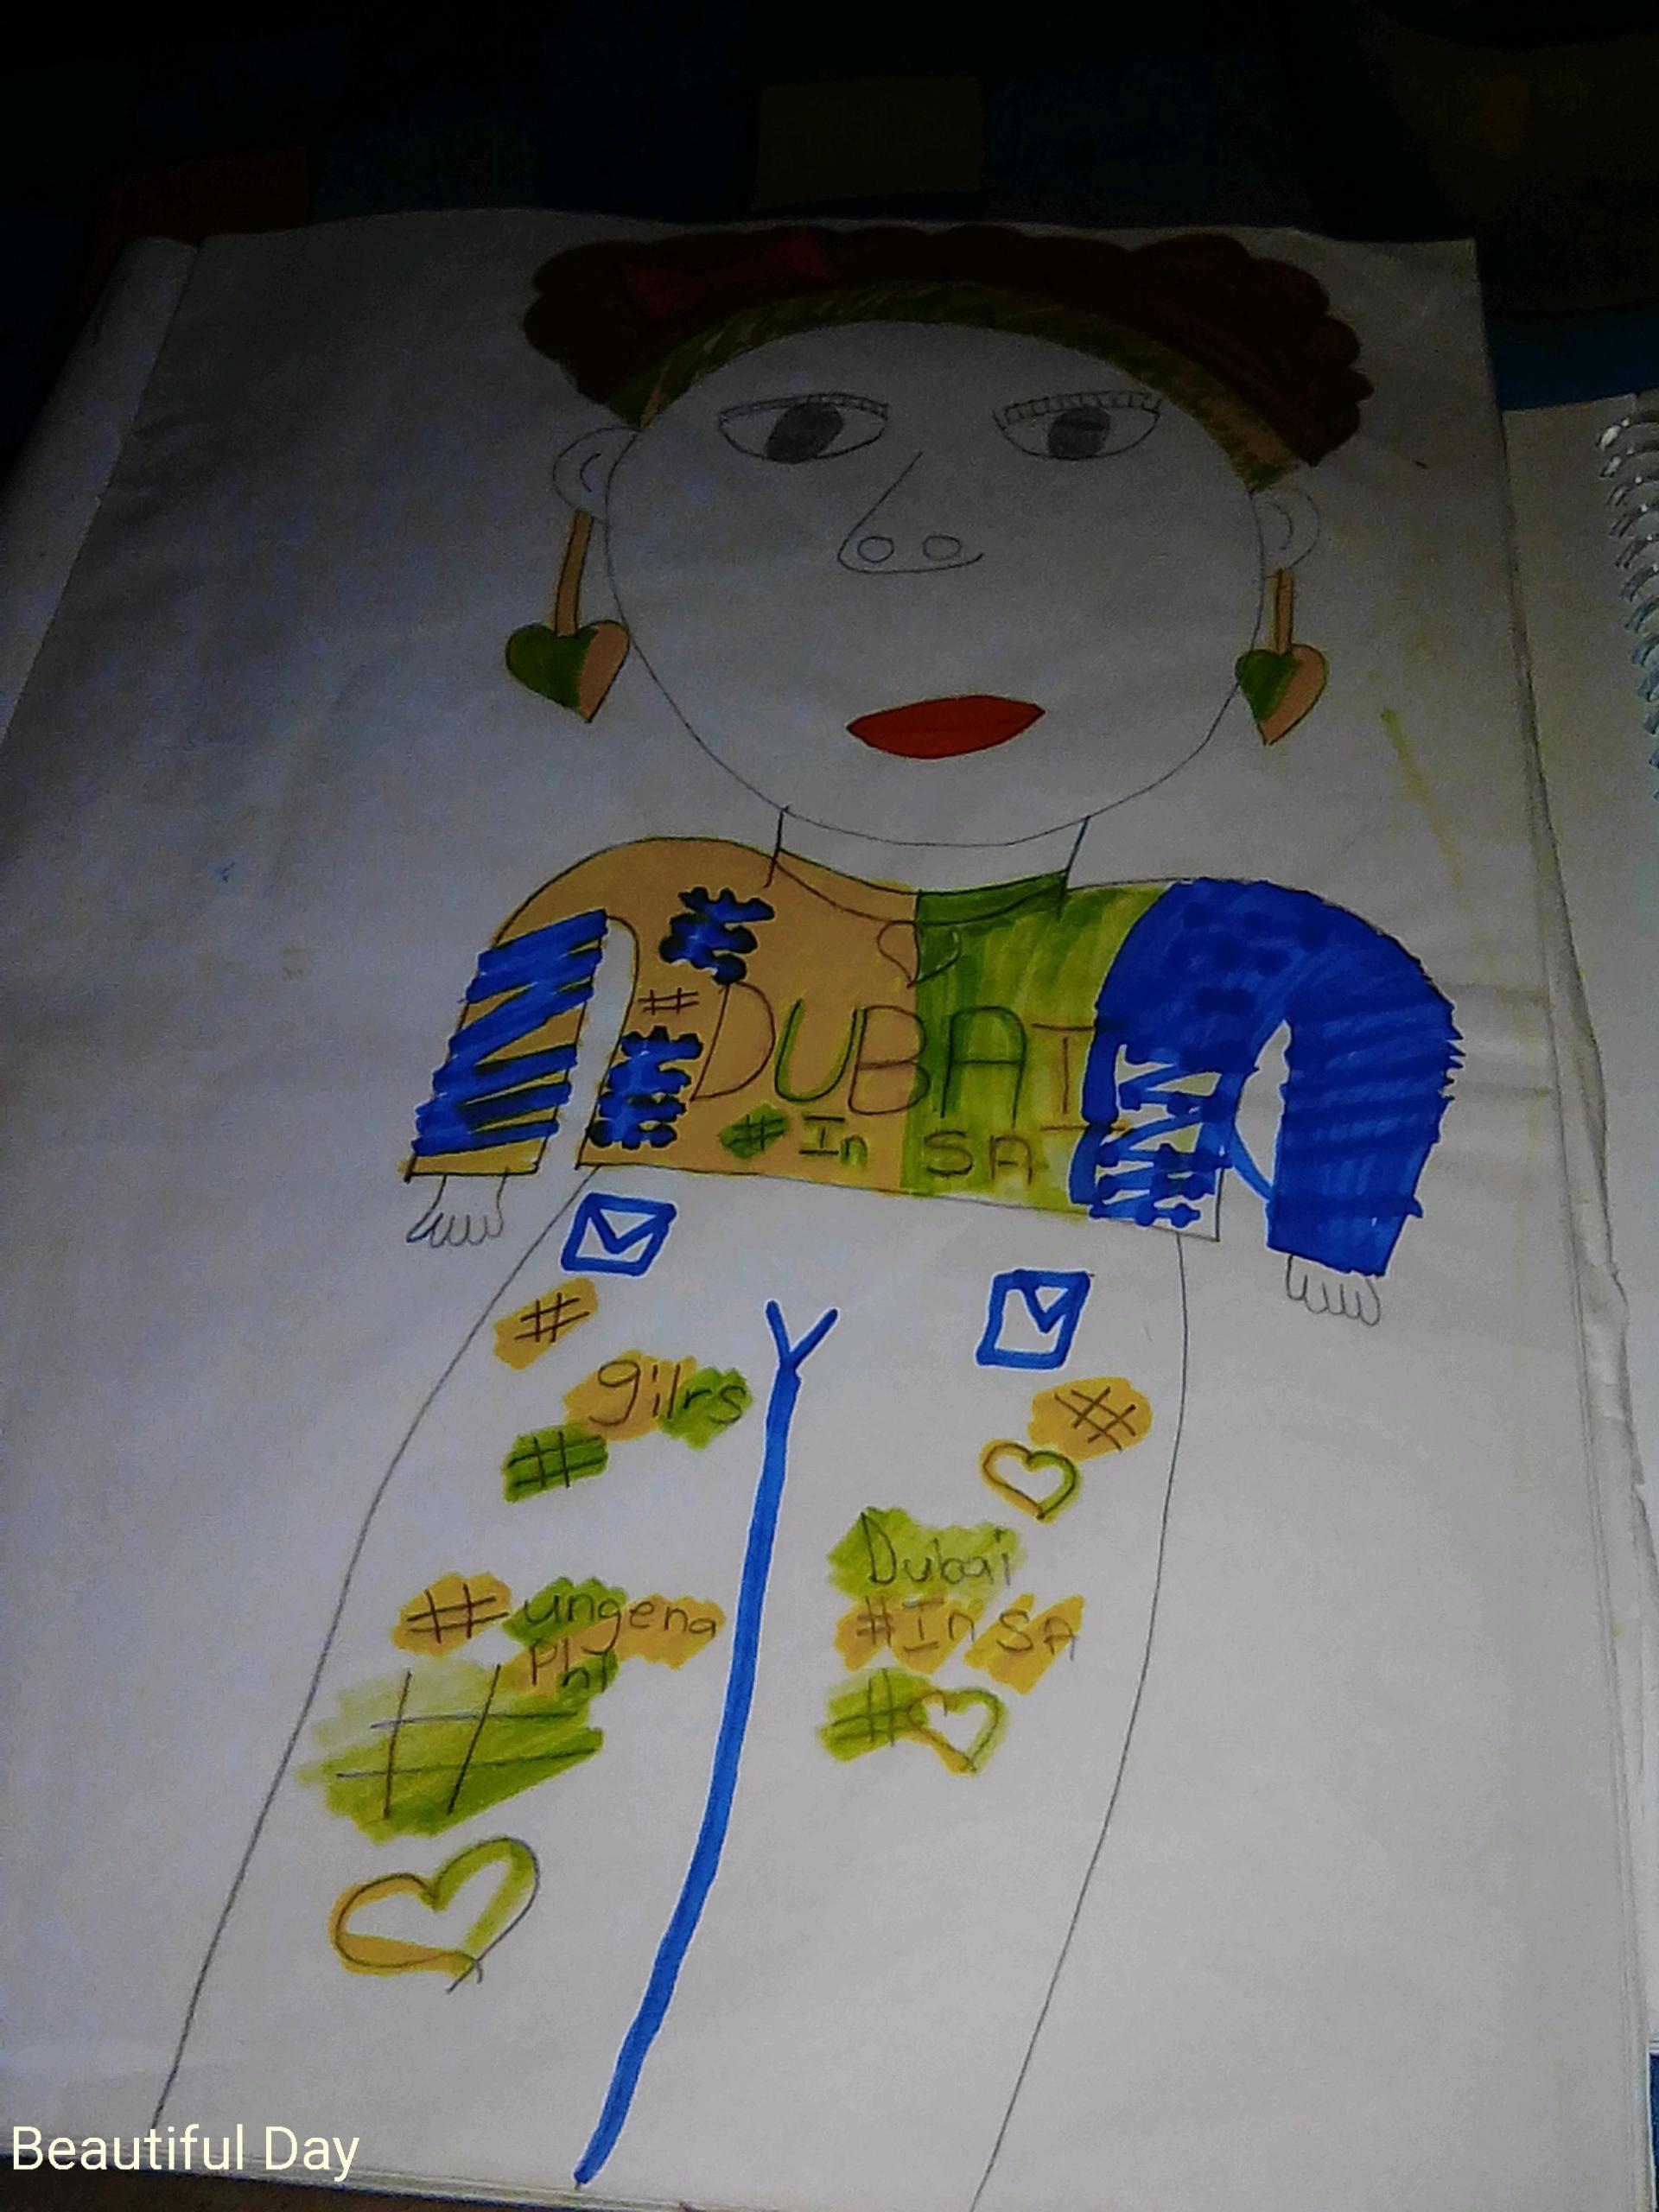 Maya C., 11years, from Durban